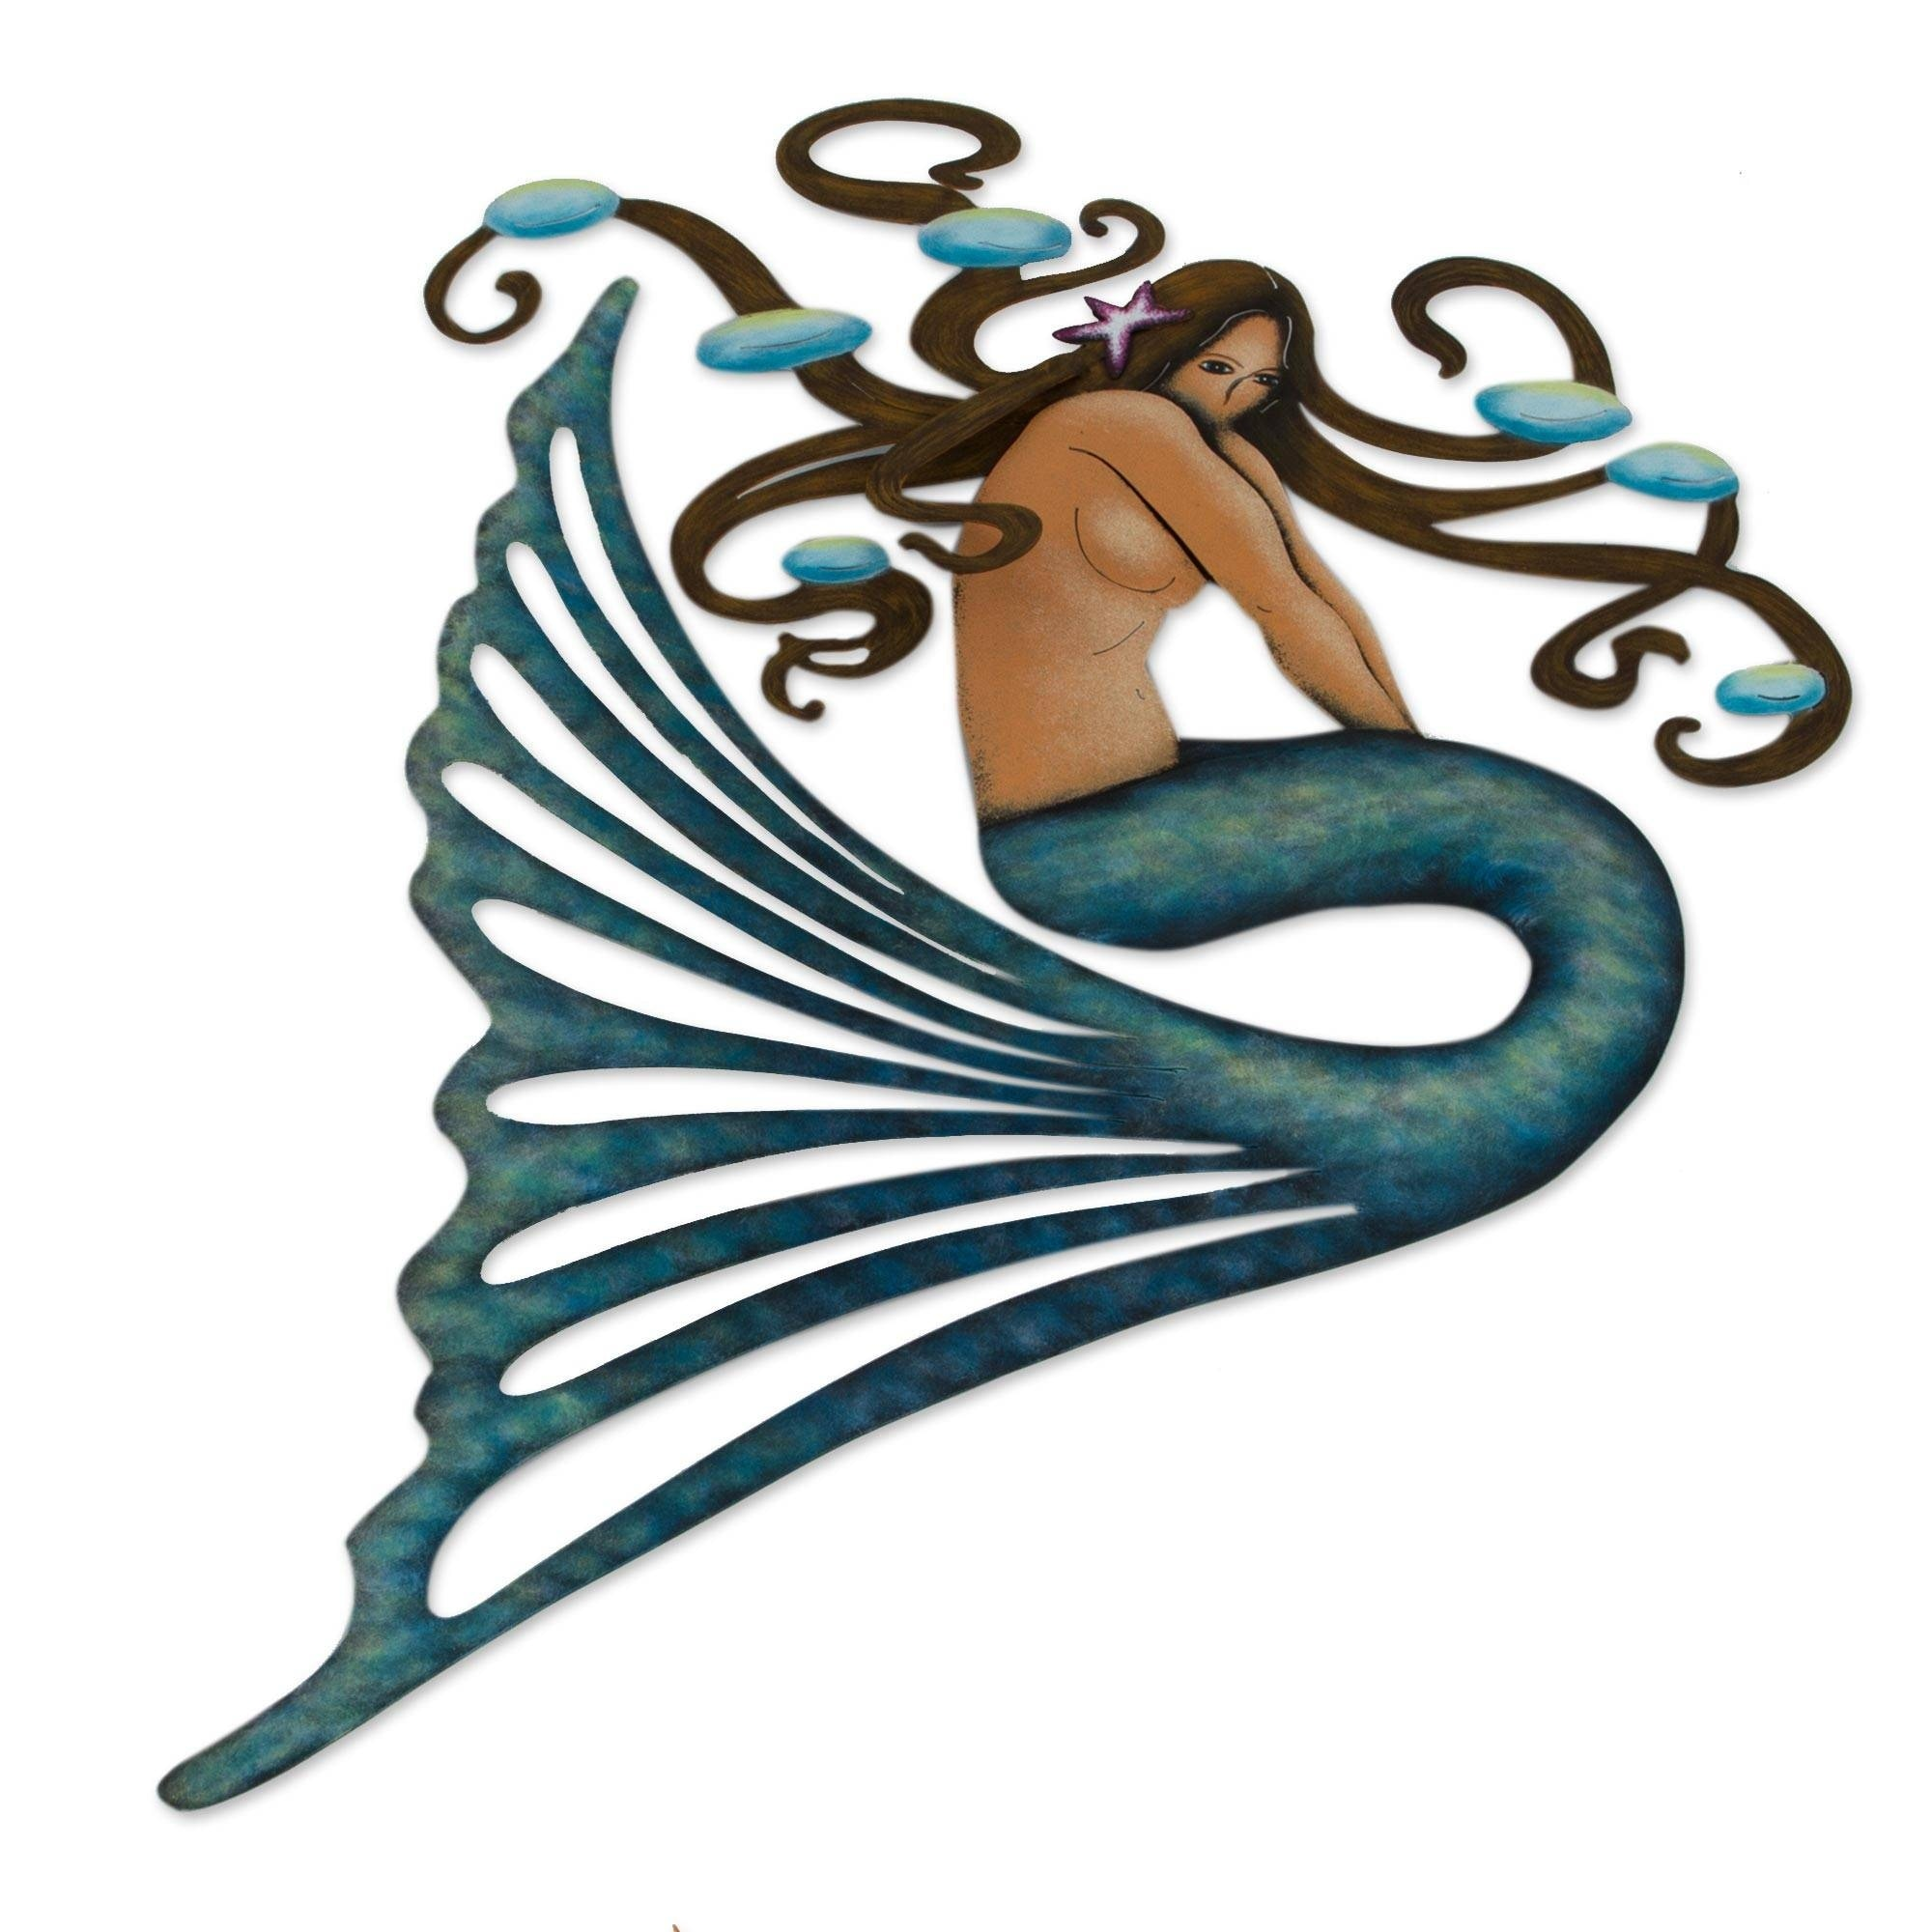 Handmade Shy Mermaid Steel Wall Art Mexico Overstock 31695806